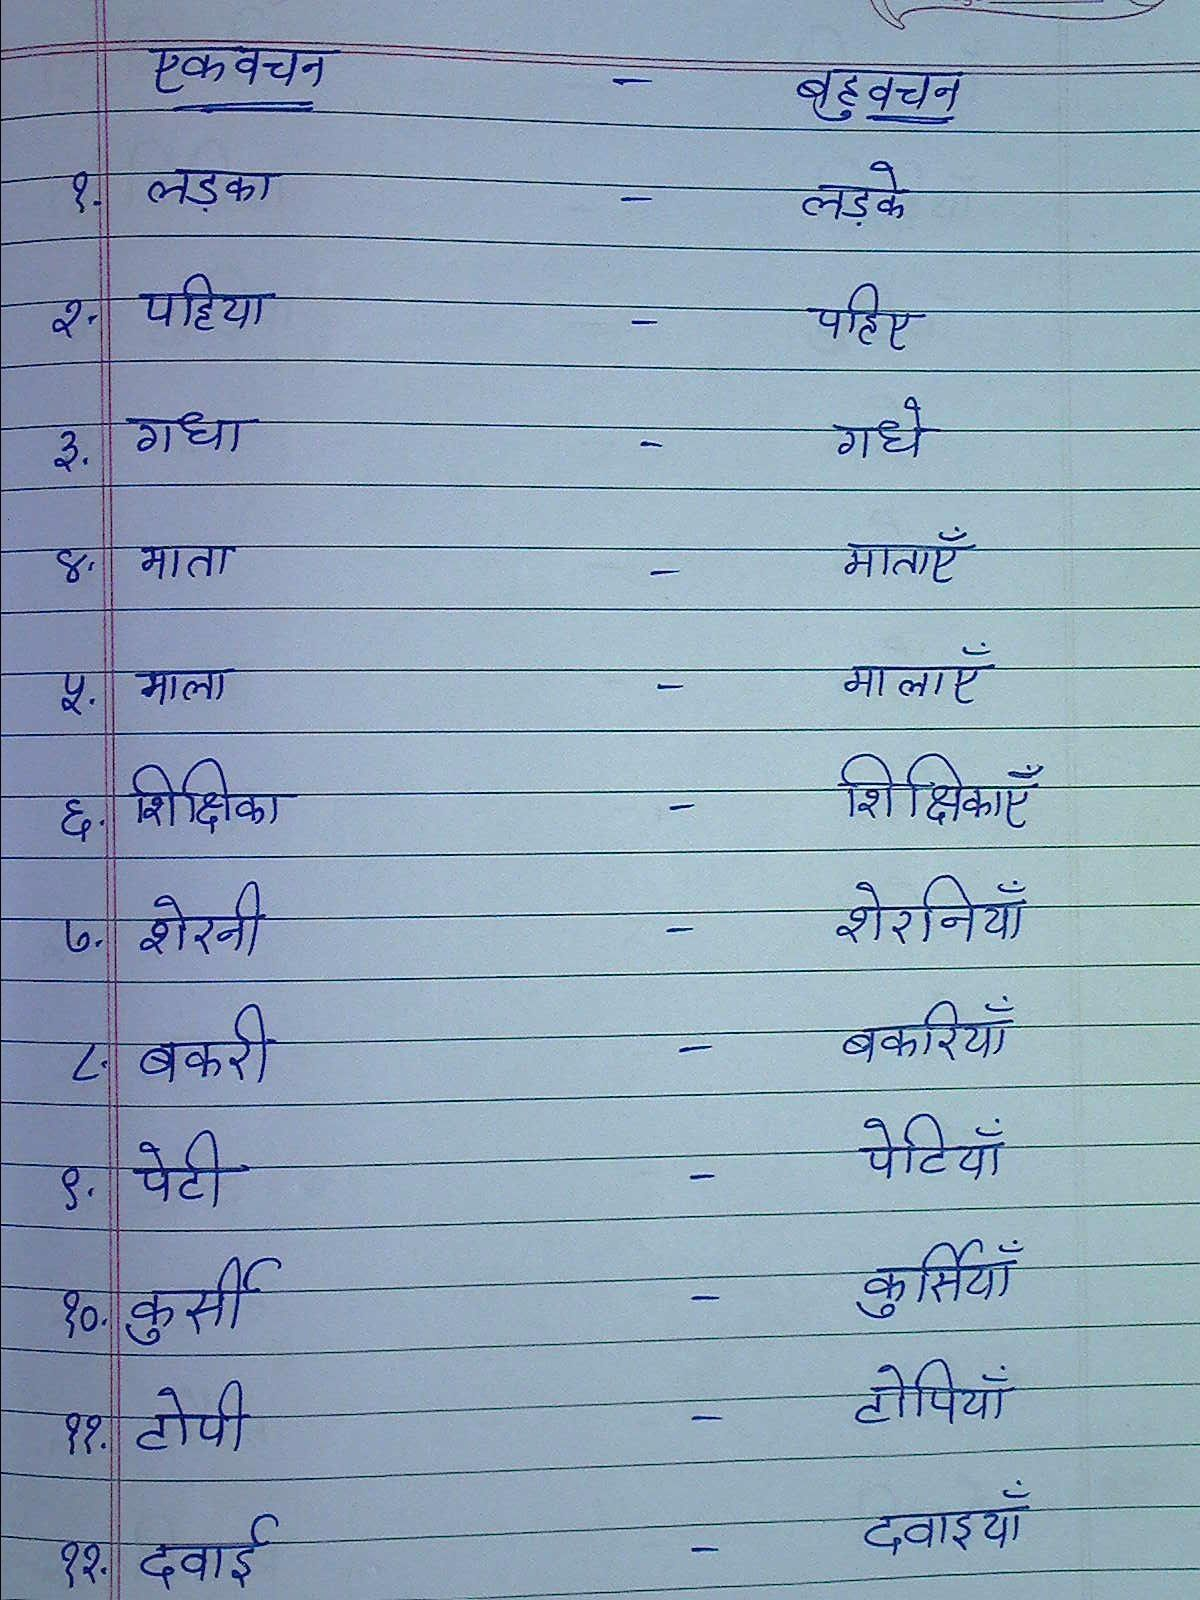 Numbers Worksheet In Hindi Fresh Hindi Grammar Kriya Worksheets For Class 2  numbers worksheet in hind…   Worksheet for class 2 [ 1600 x 1200 Pixel ]